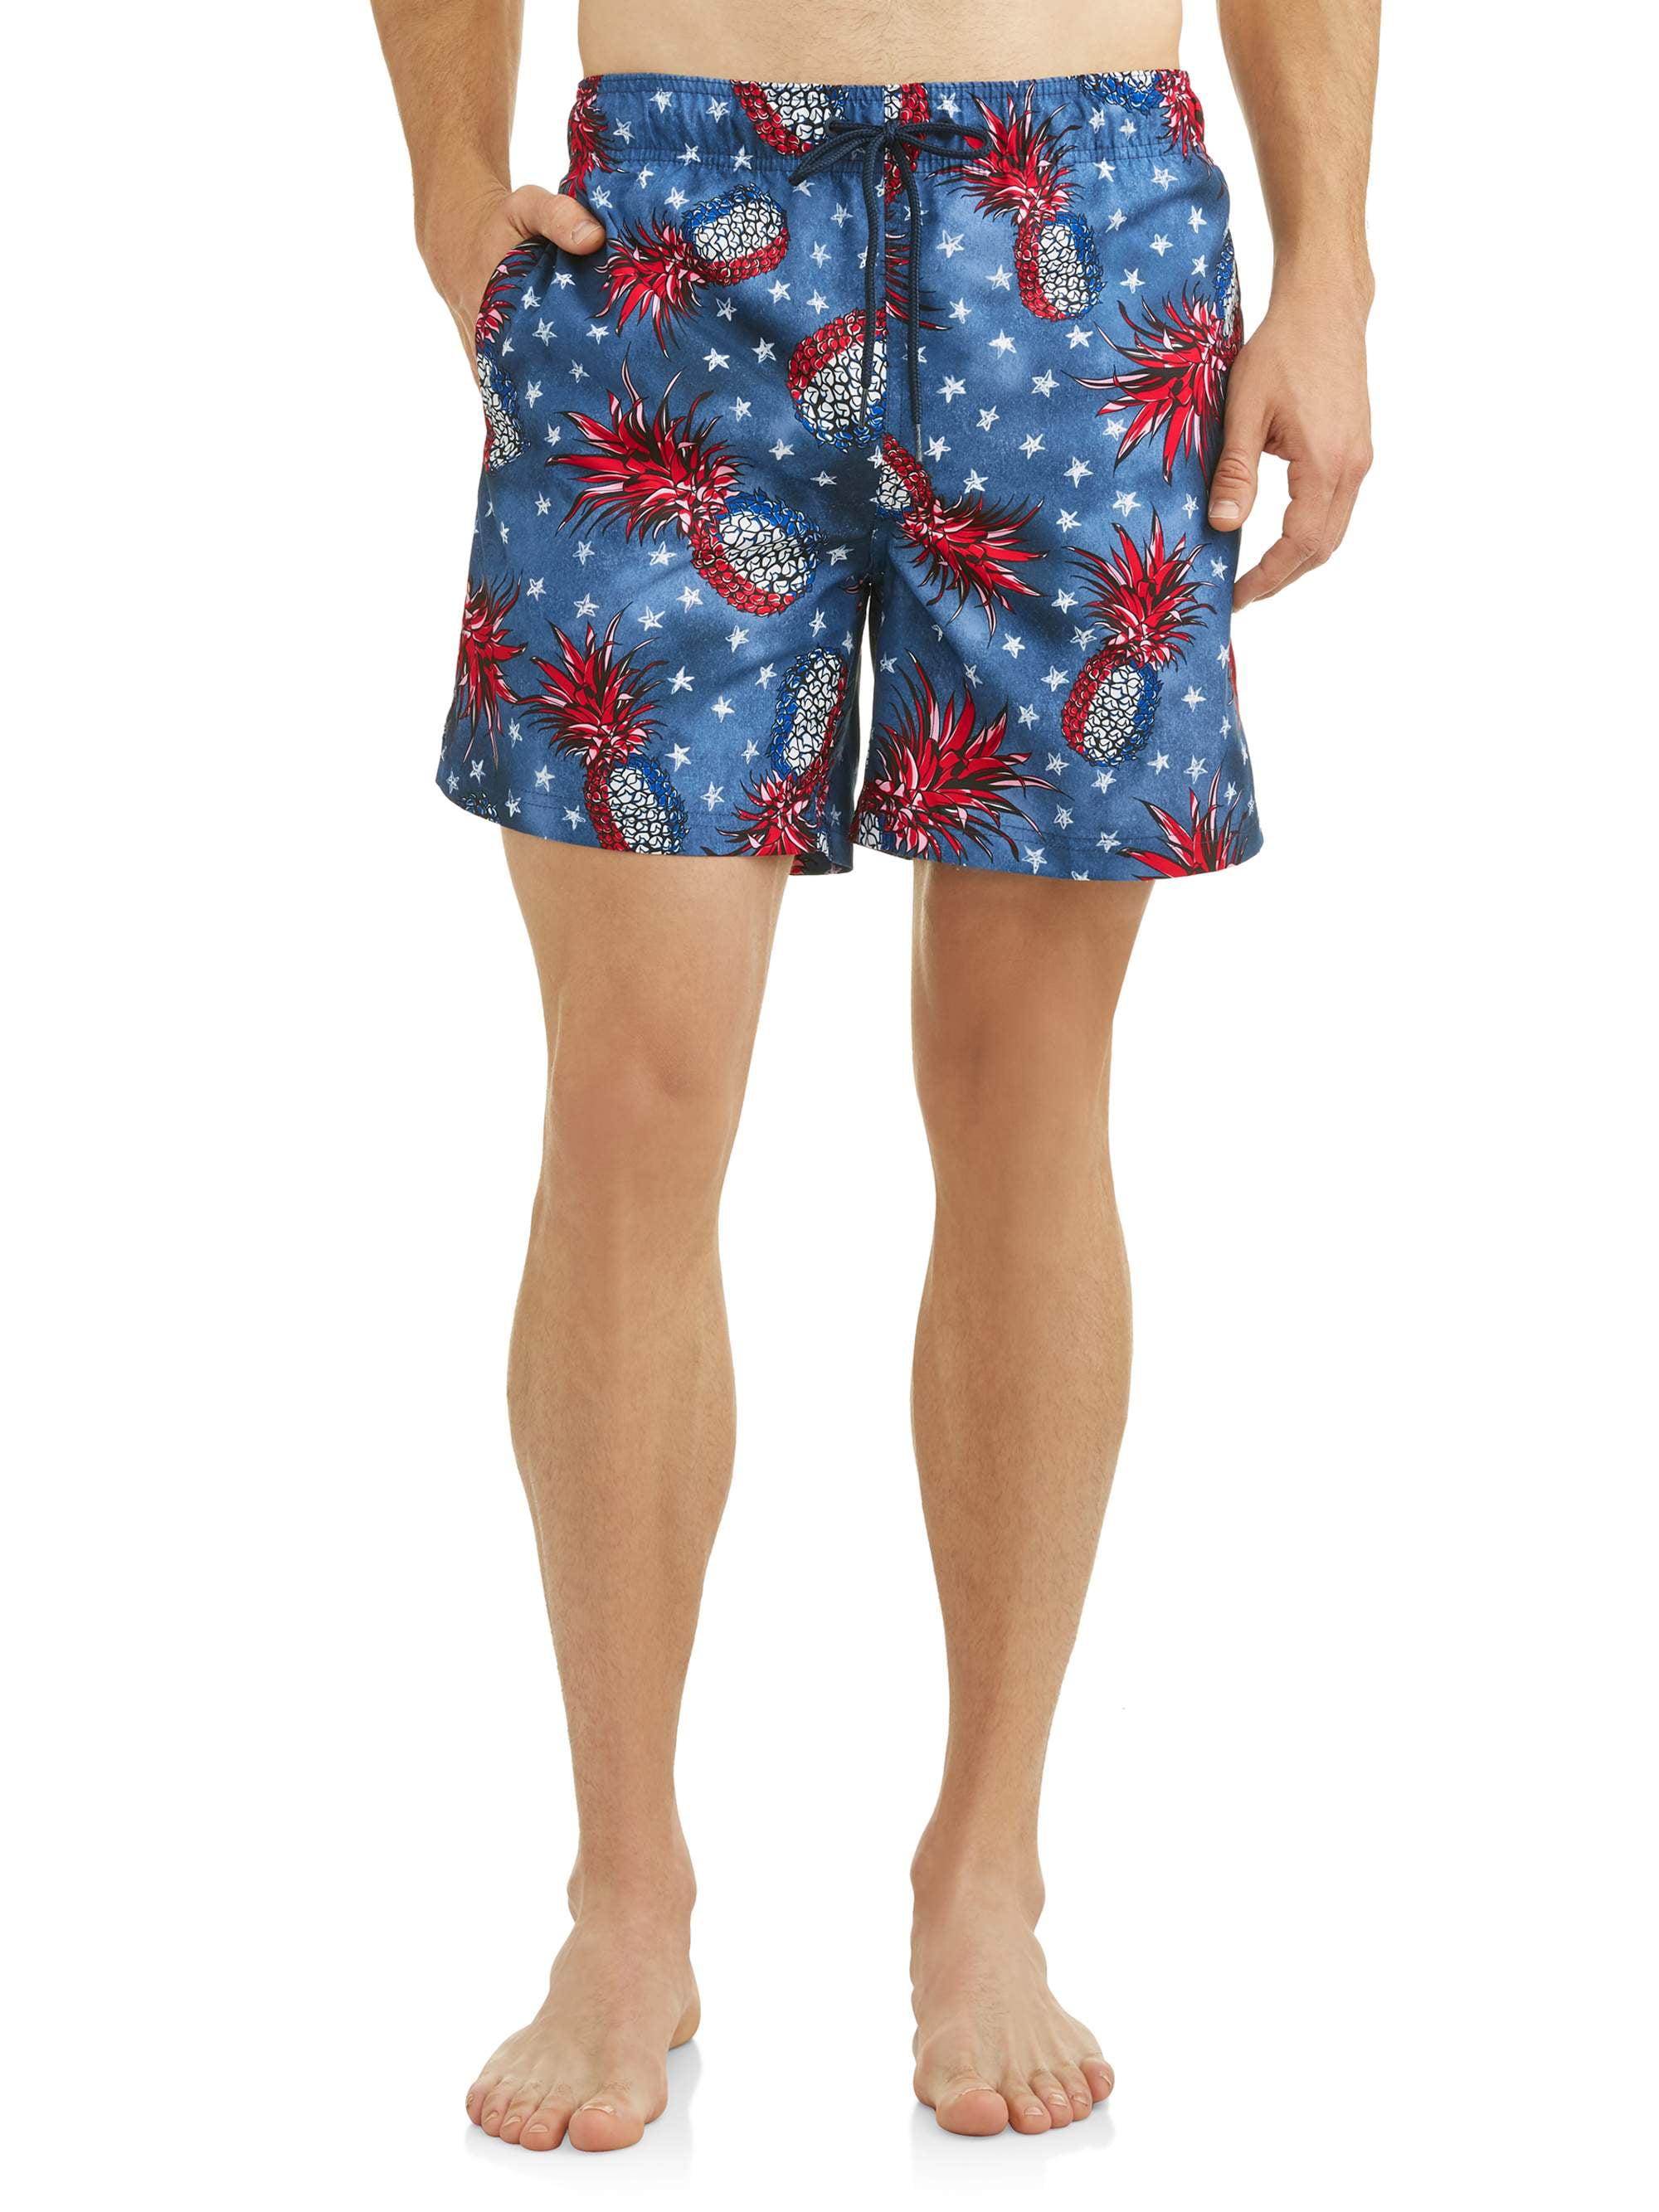 Men's Pineapple Americana Swim Short, up to size 5XL